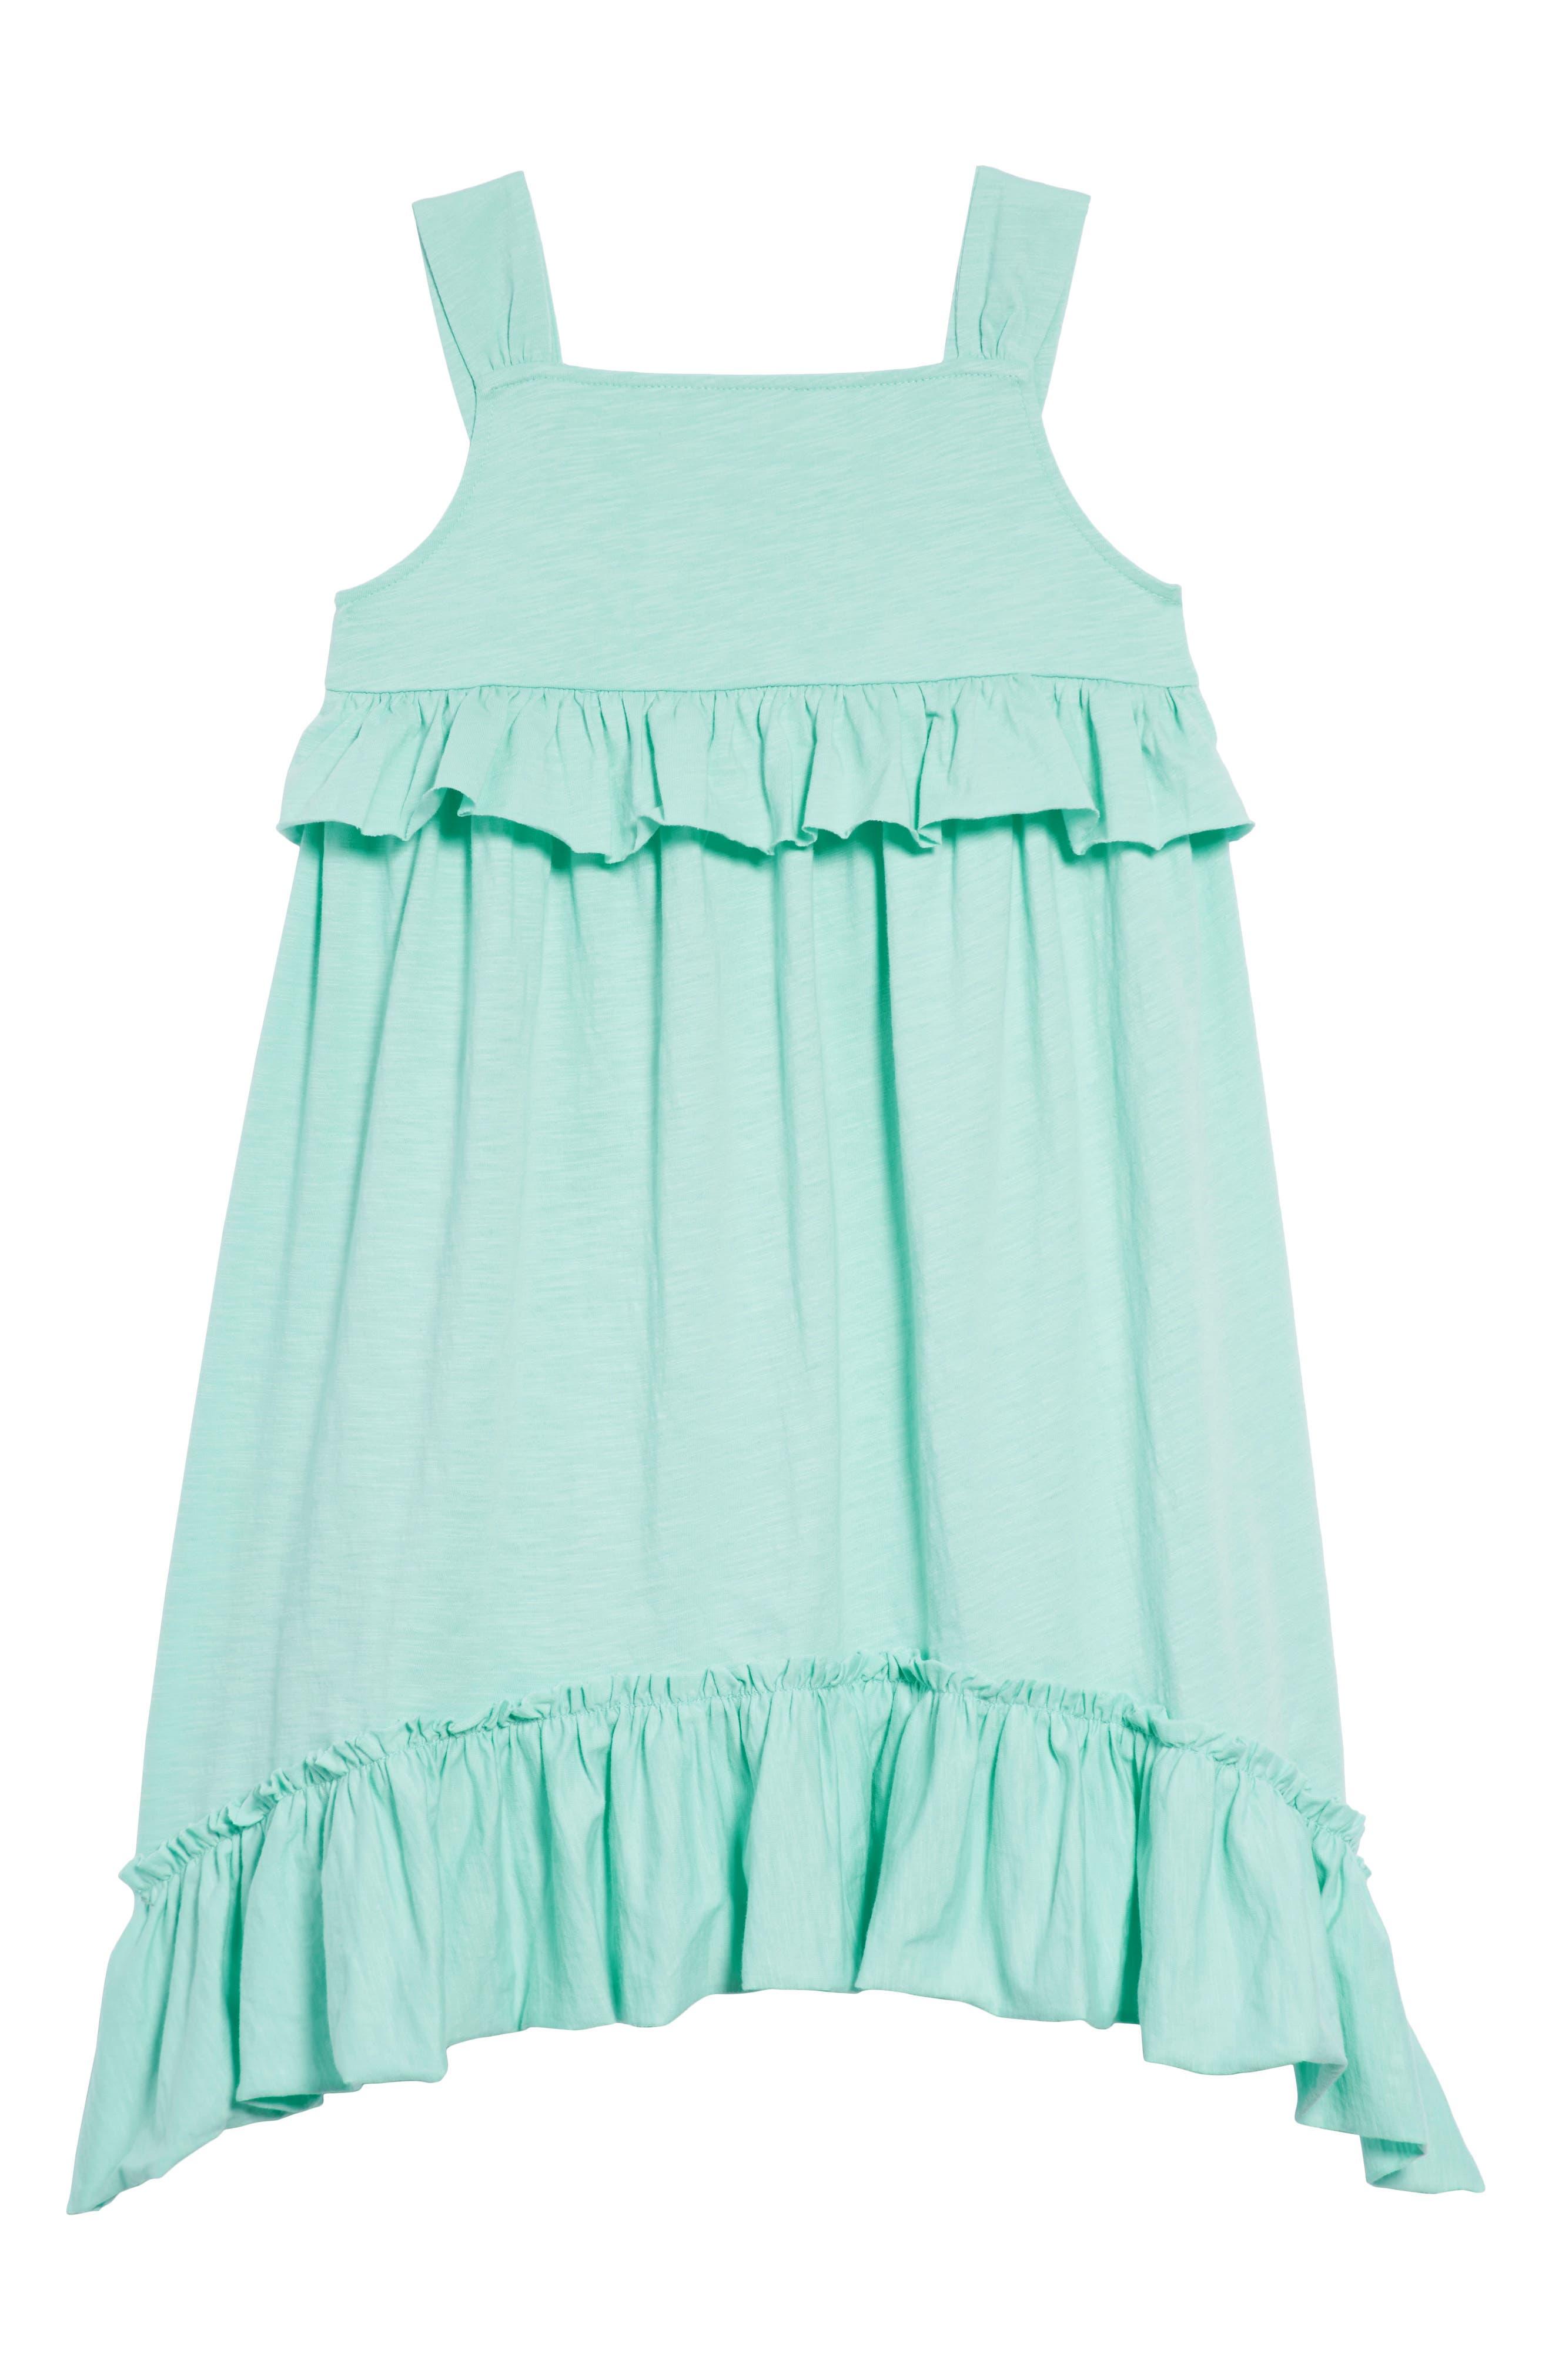 Mimi Ruffle Dress,                         Main,                         color, Sunwashed Aqua Gr5839